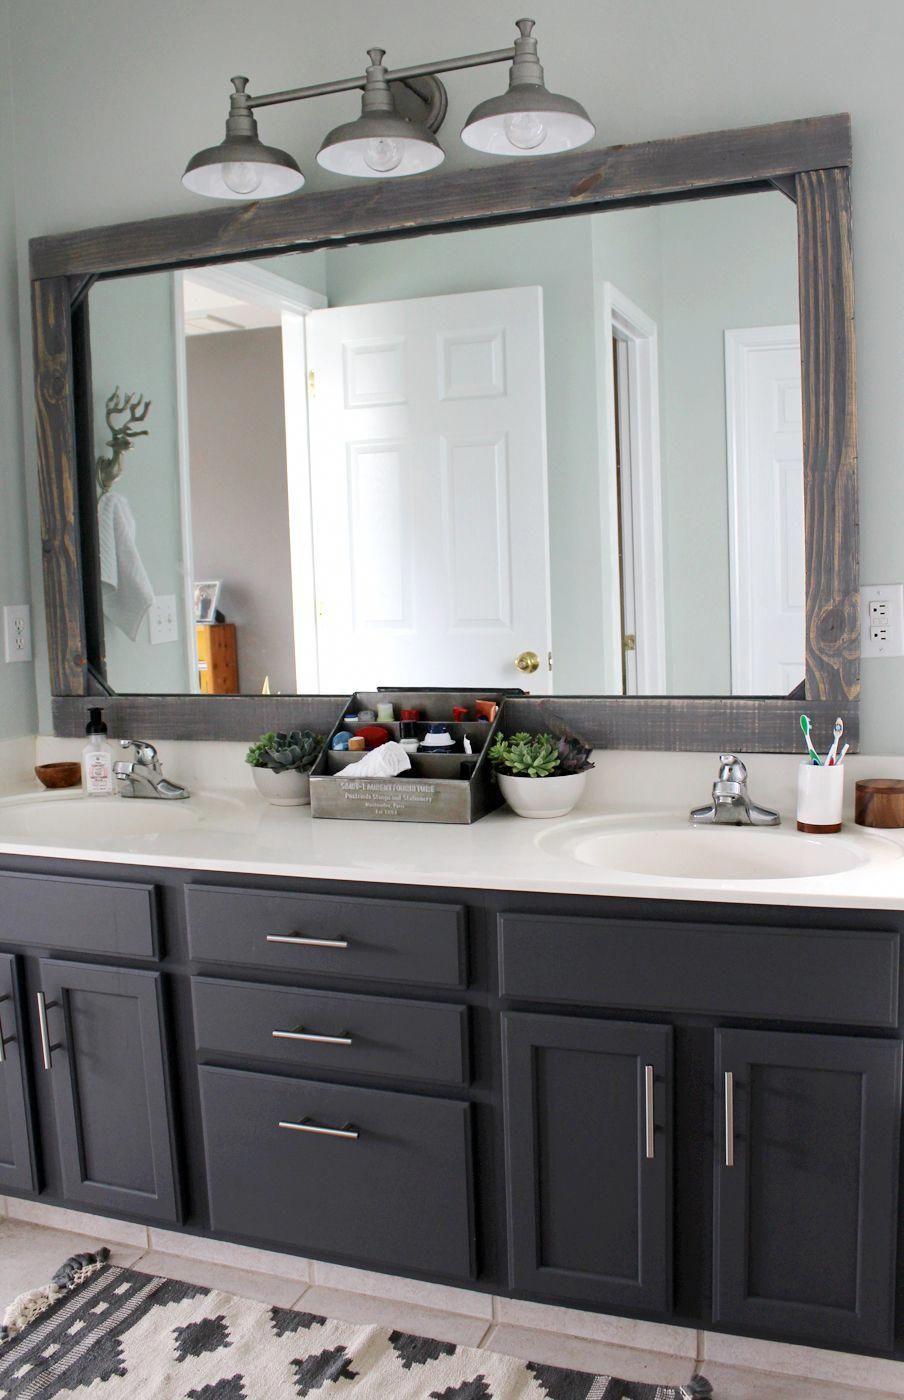 25 Best Bathroom Mirror Ideas For A Small Bathroom Bathroom Remodel Master Master Bathroom Makeover Bathroom Mirror Design